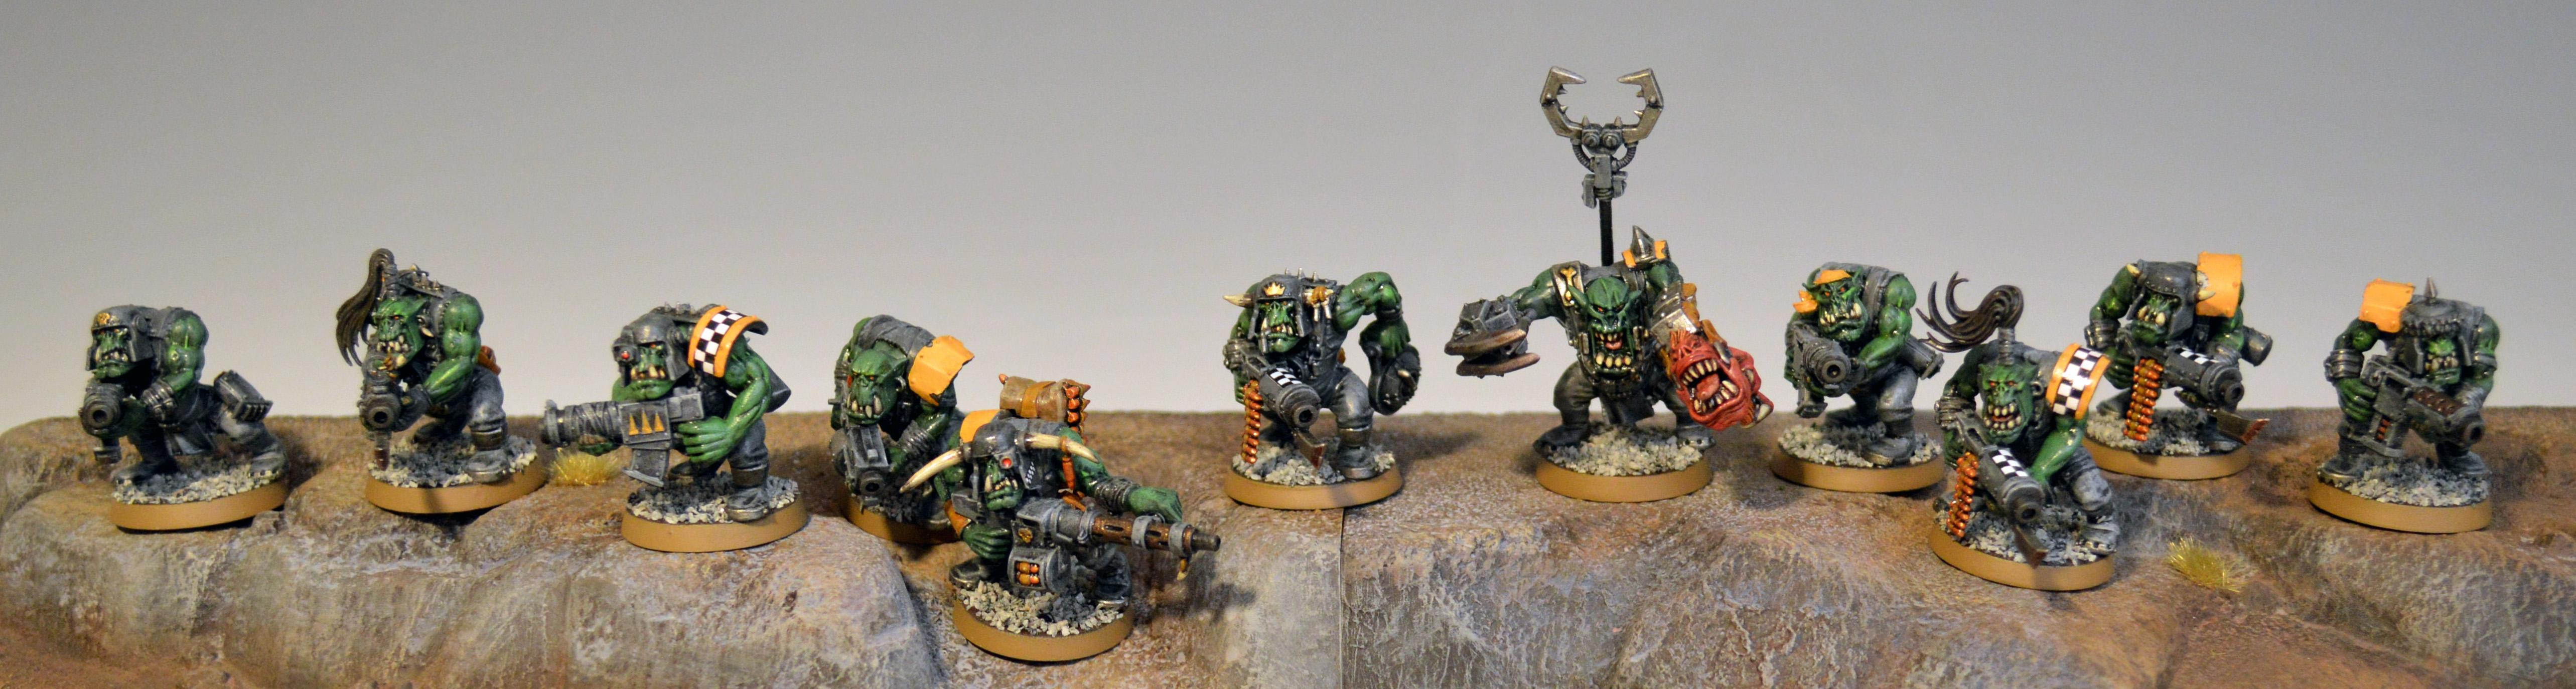 Boy, Orks, Shoota Boyz 3